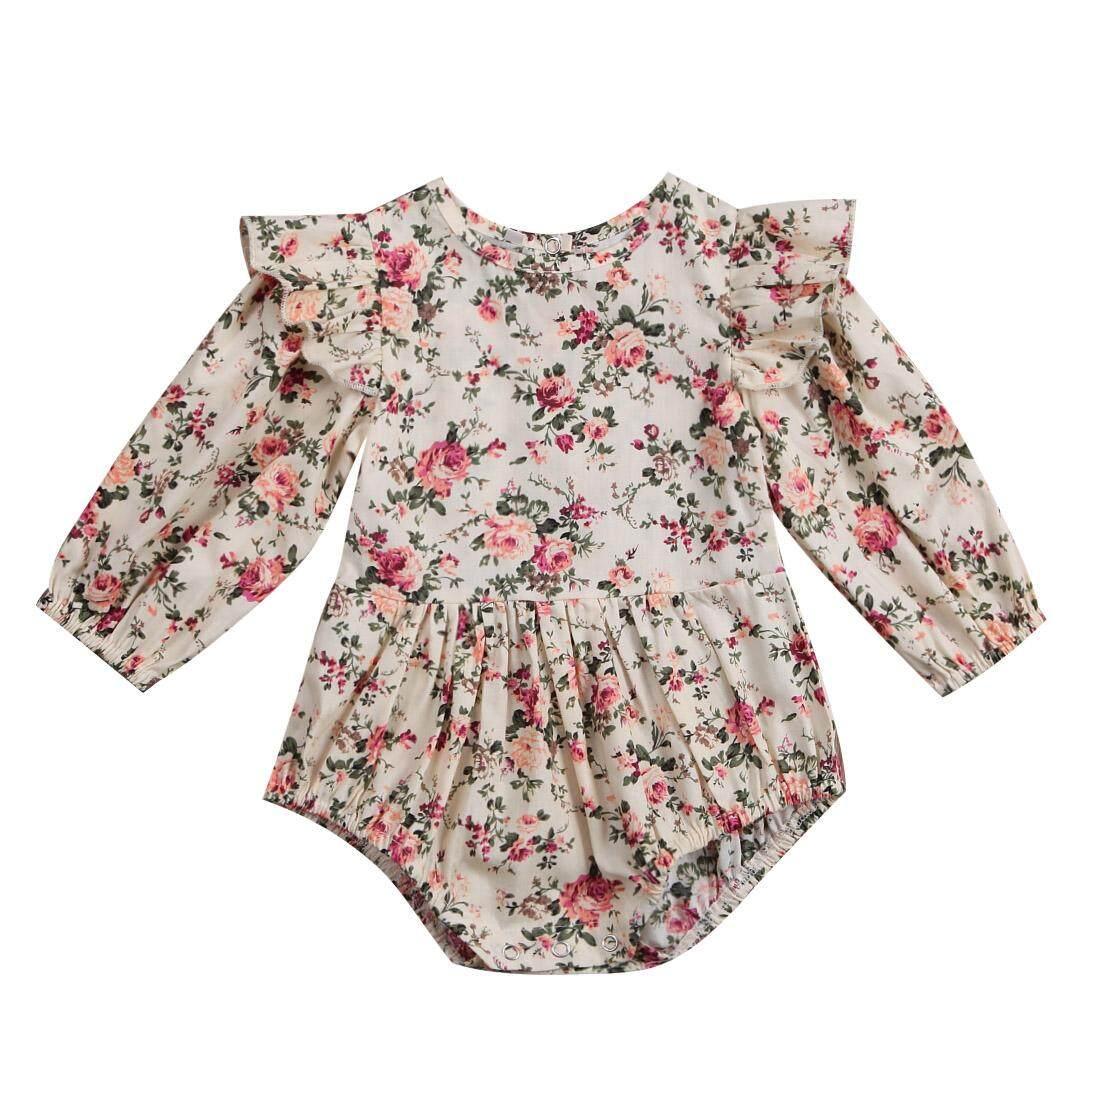 Balita Cantik Bayi Perempuan Bunga Baju Romper Pakaian Bermain Jumpsuit Pakaian-Internasional